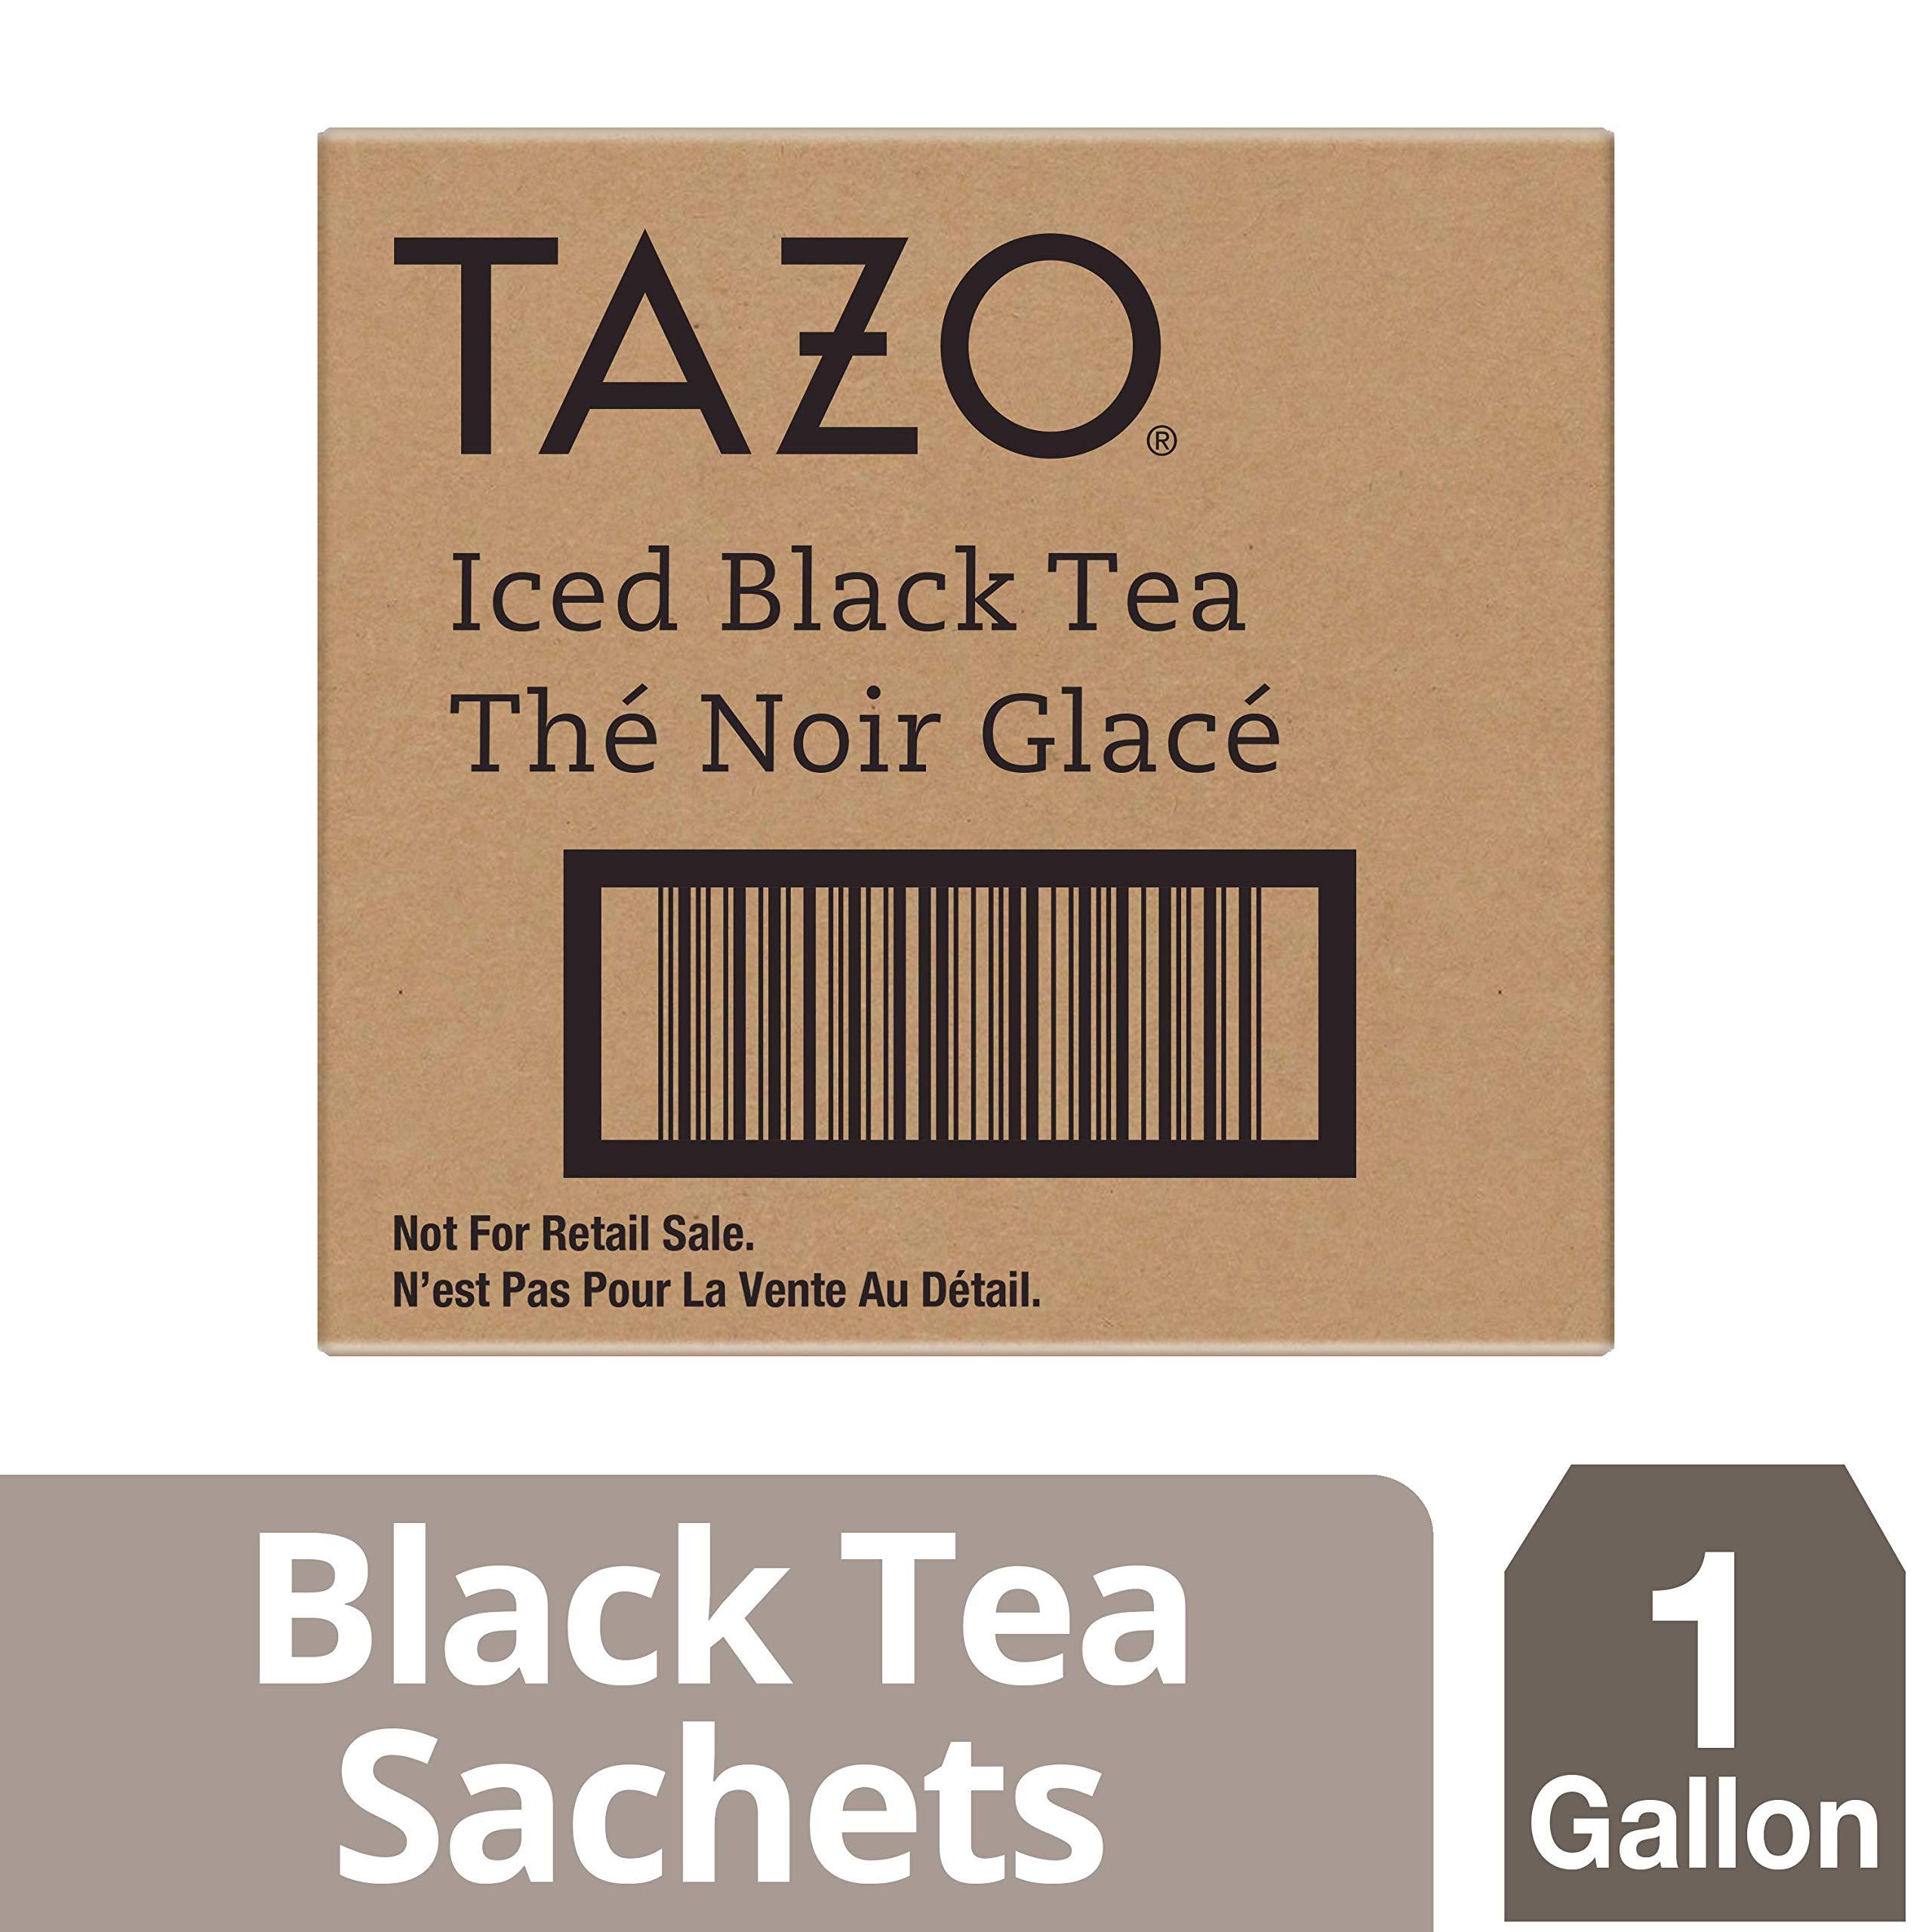 Tazo Black Unsweetened Fresh Brewed Iced Tea Non GMO, 1 gallon, Pack of 20